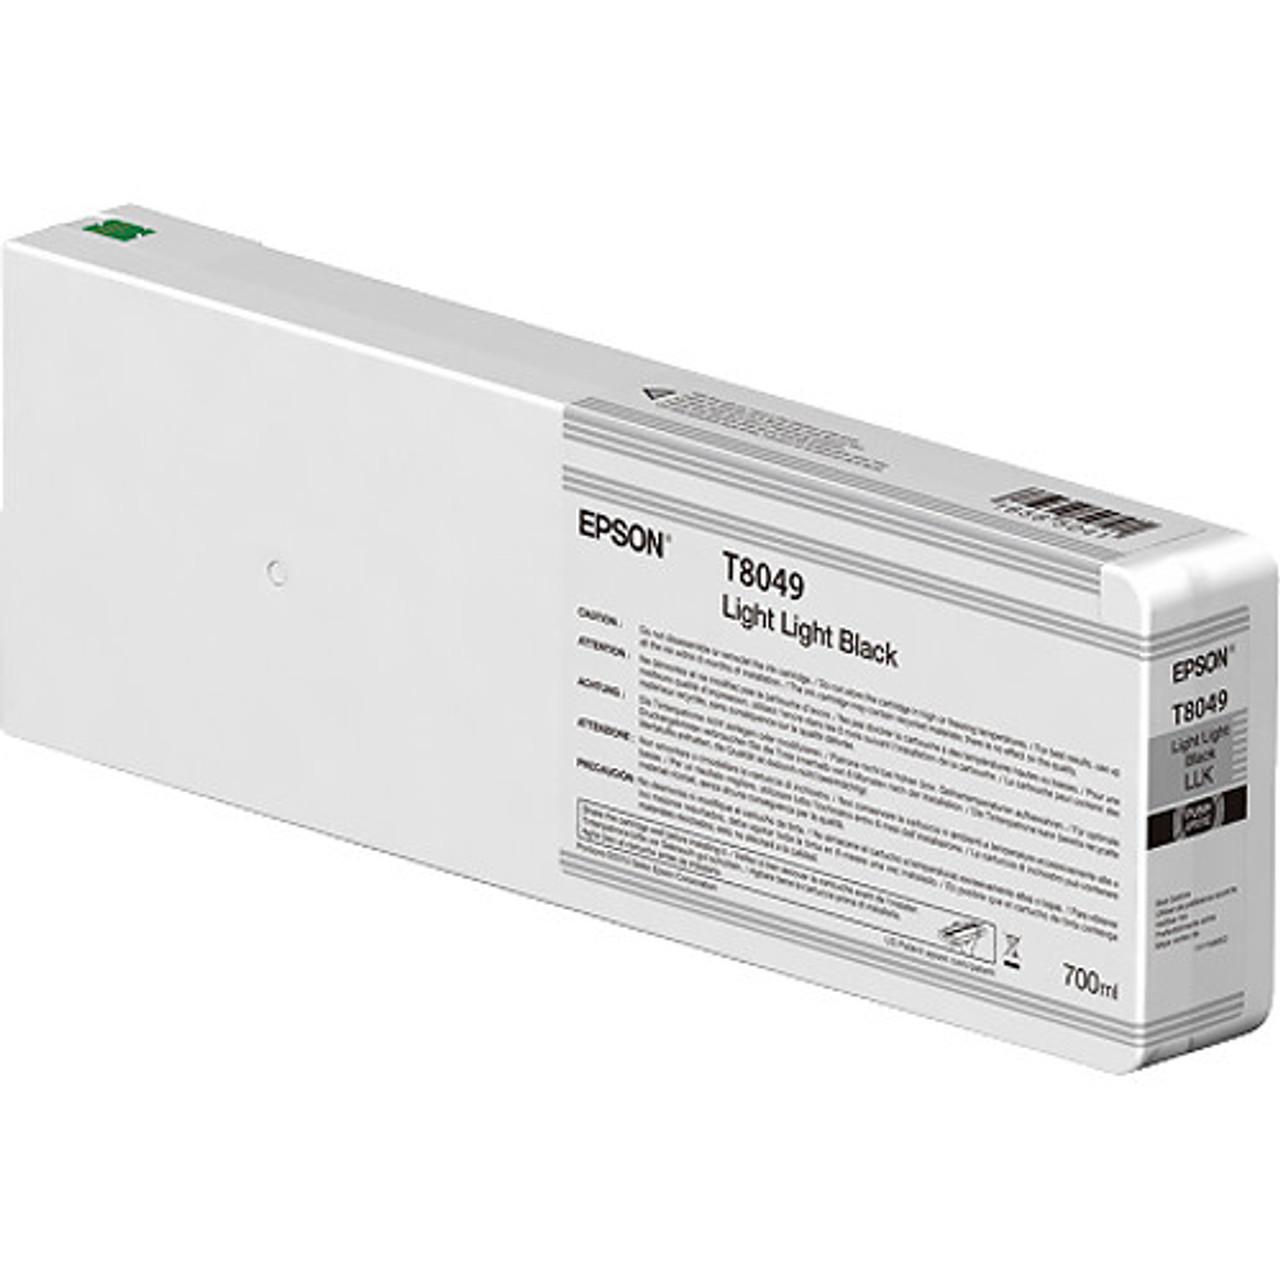 Epson T804900 UltraChrome HD Light Light Black Ink Cartridge (700ml)